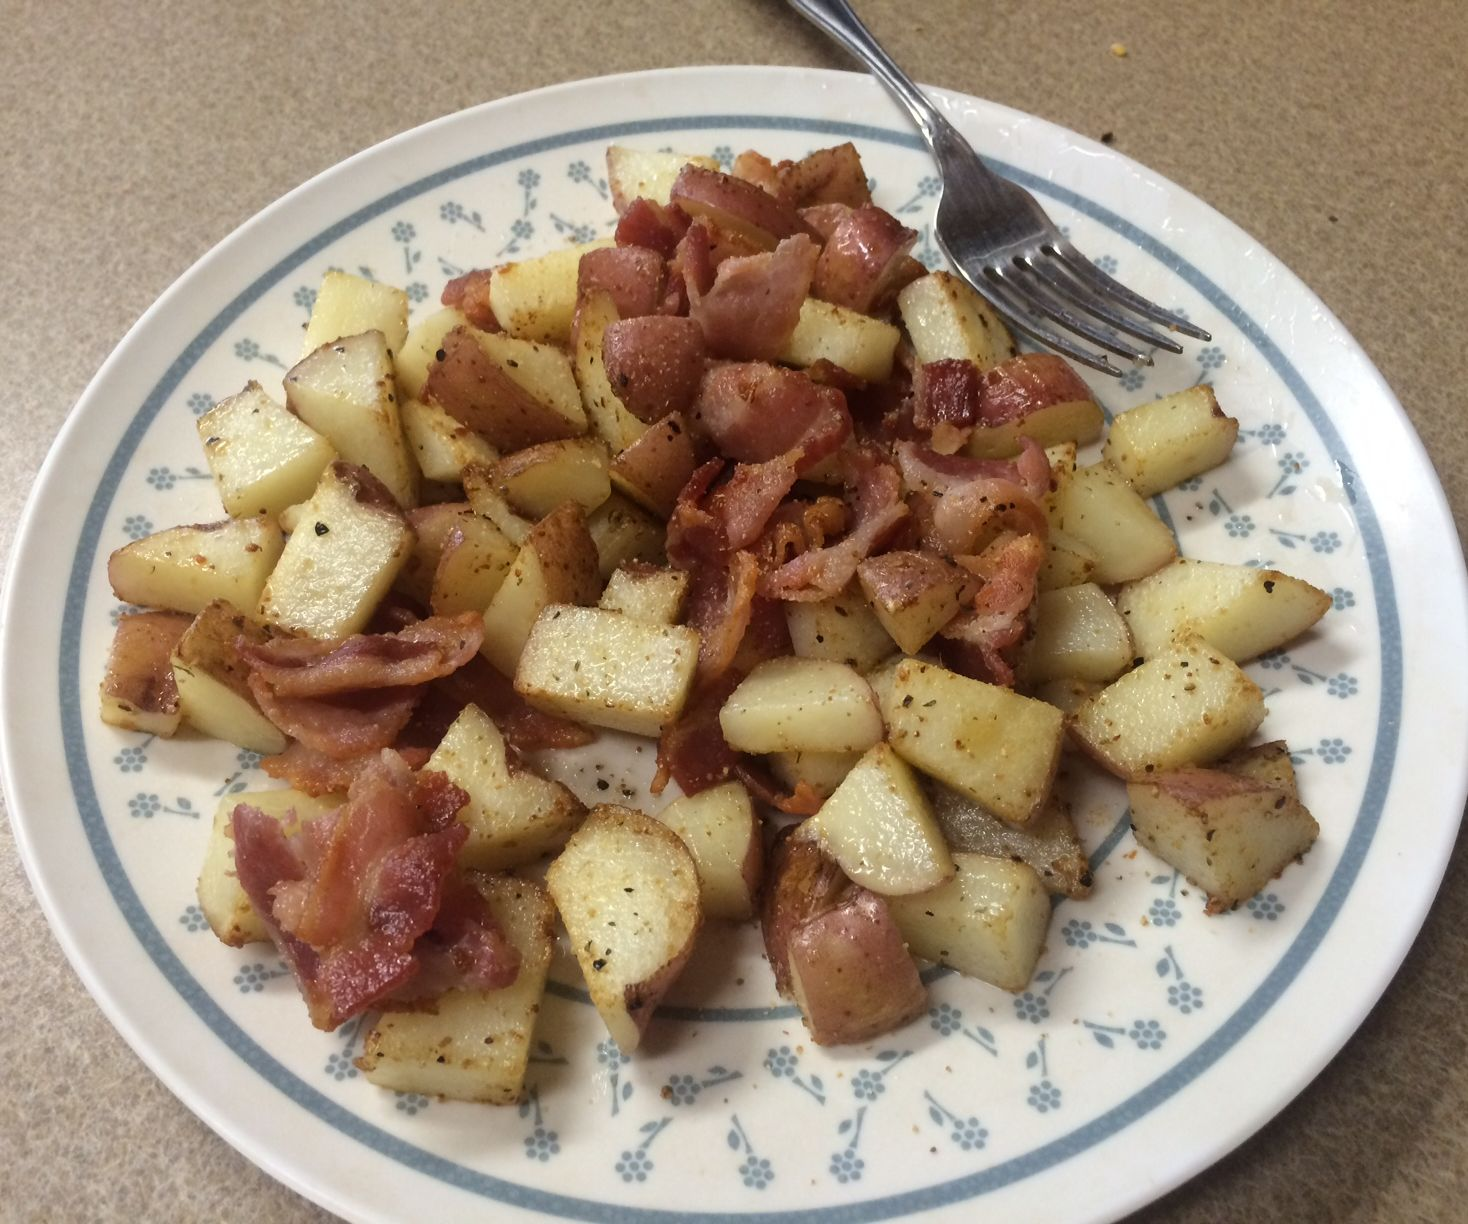 Bacon and Tatos